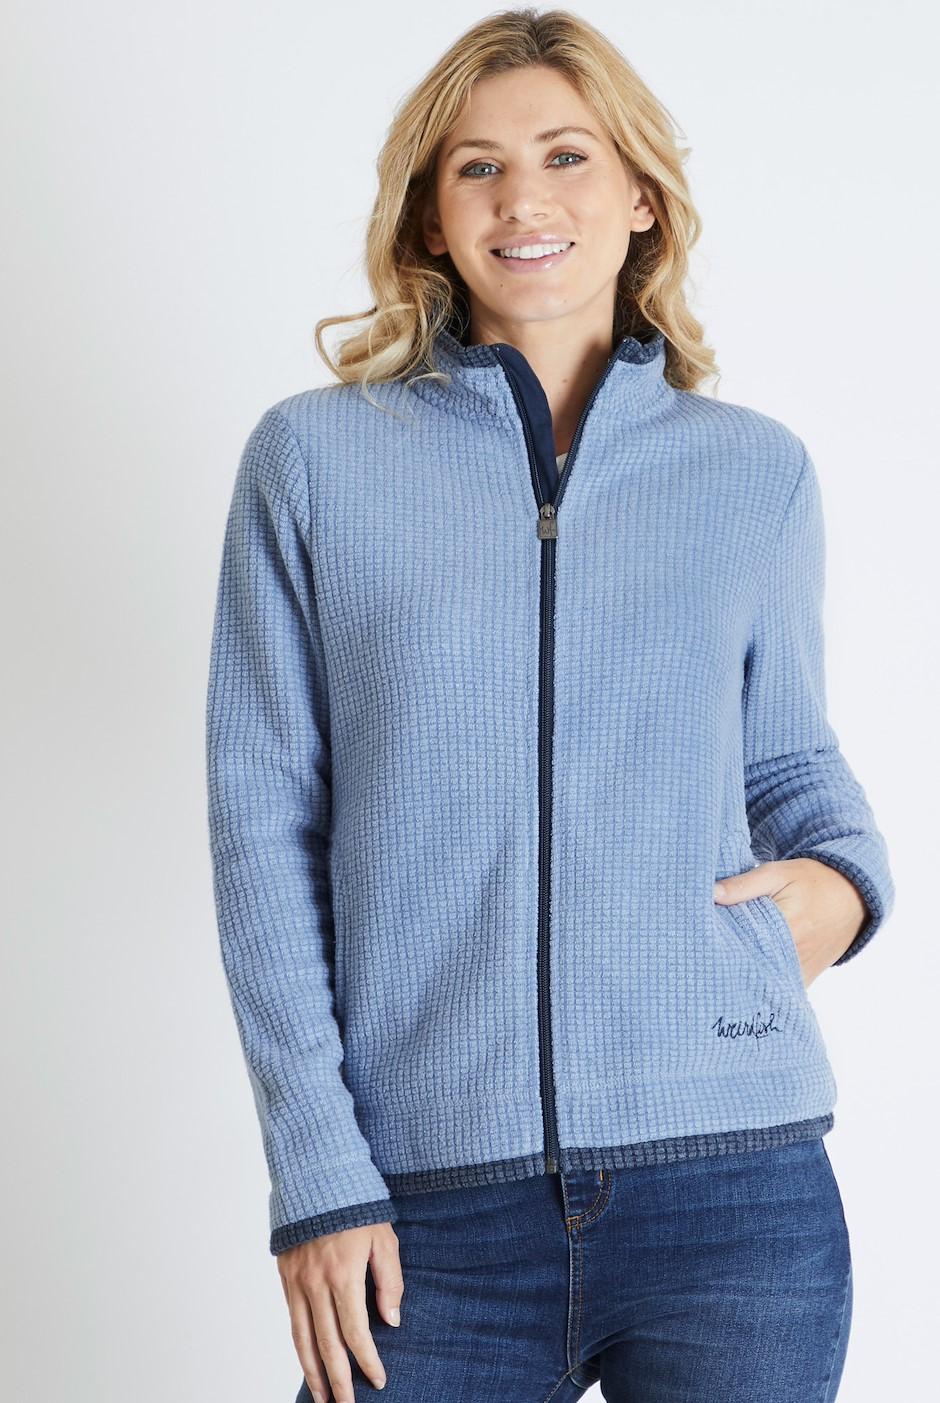 Ariana Grid Fleece Jacket Light Blue